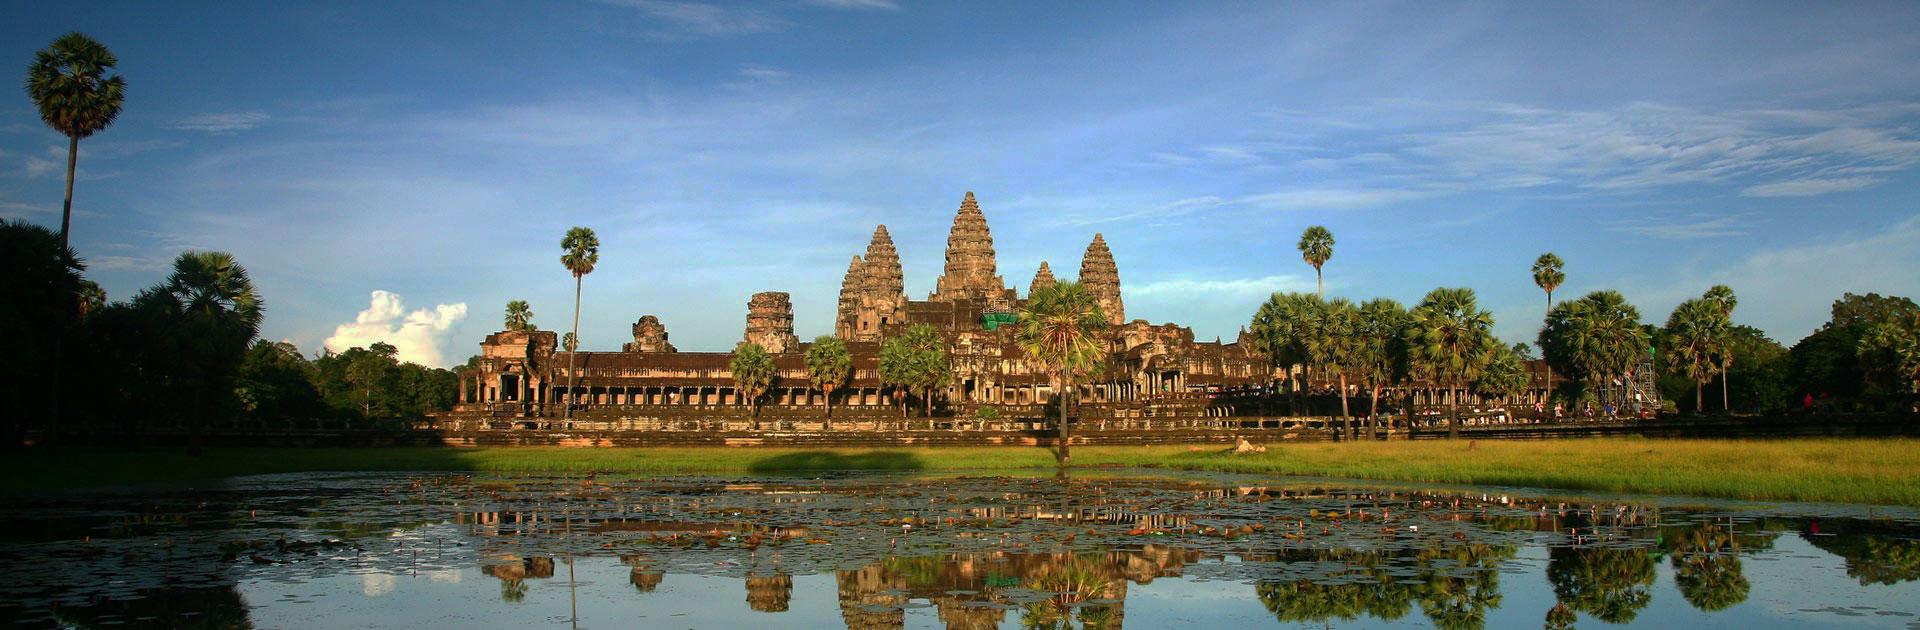 KHMM Myanmar con Camboya 16 días 3